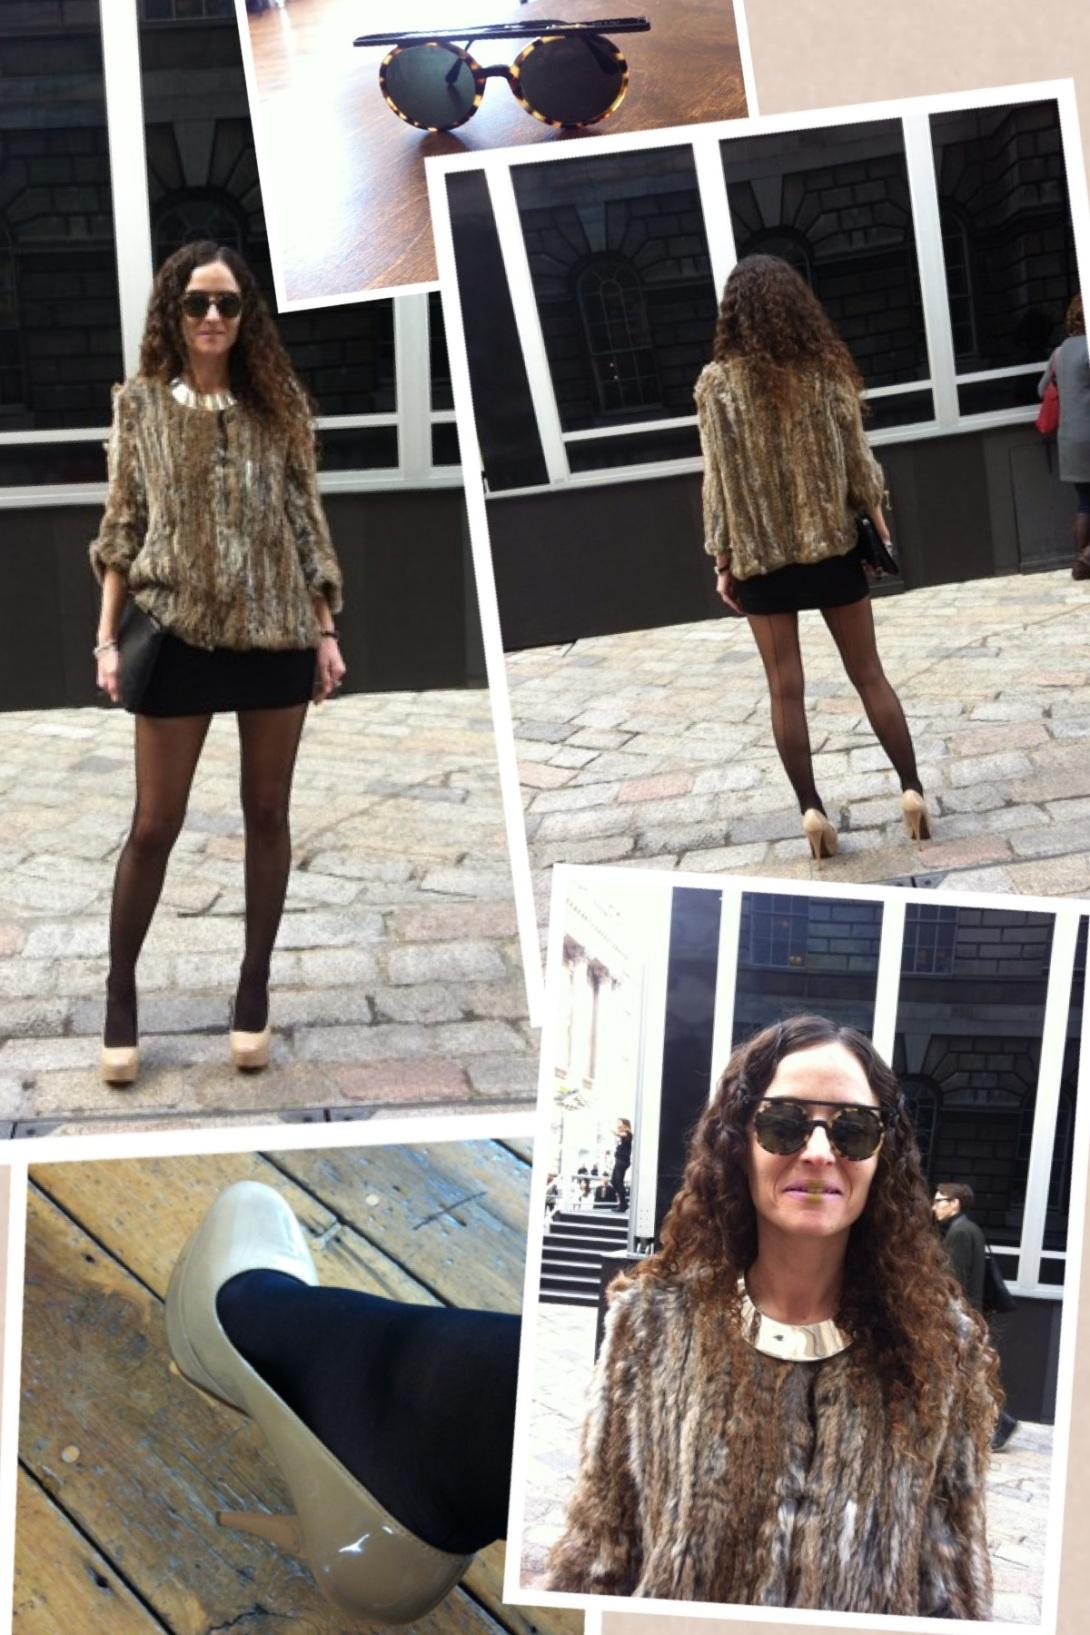 London Fashion Week - Outfit Day 4 - muymia